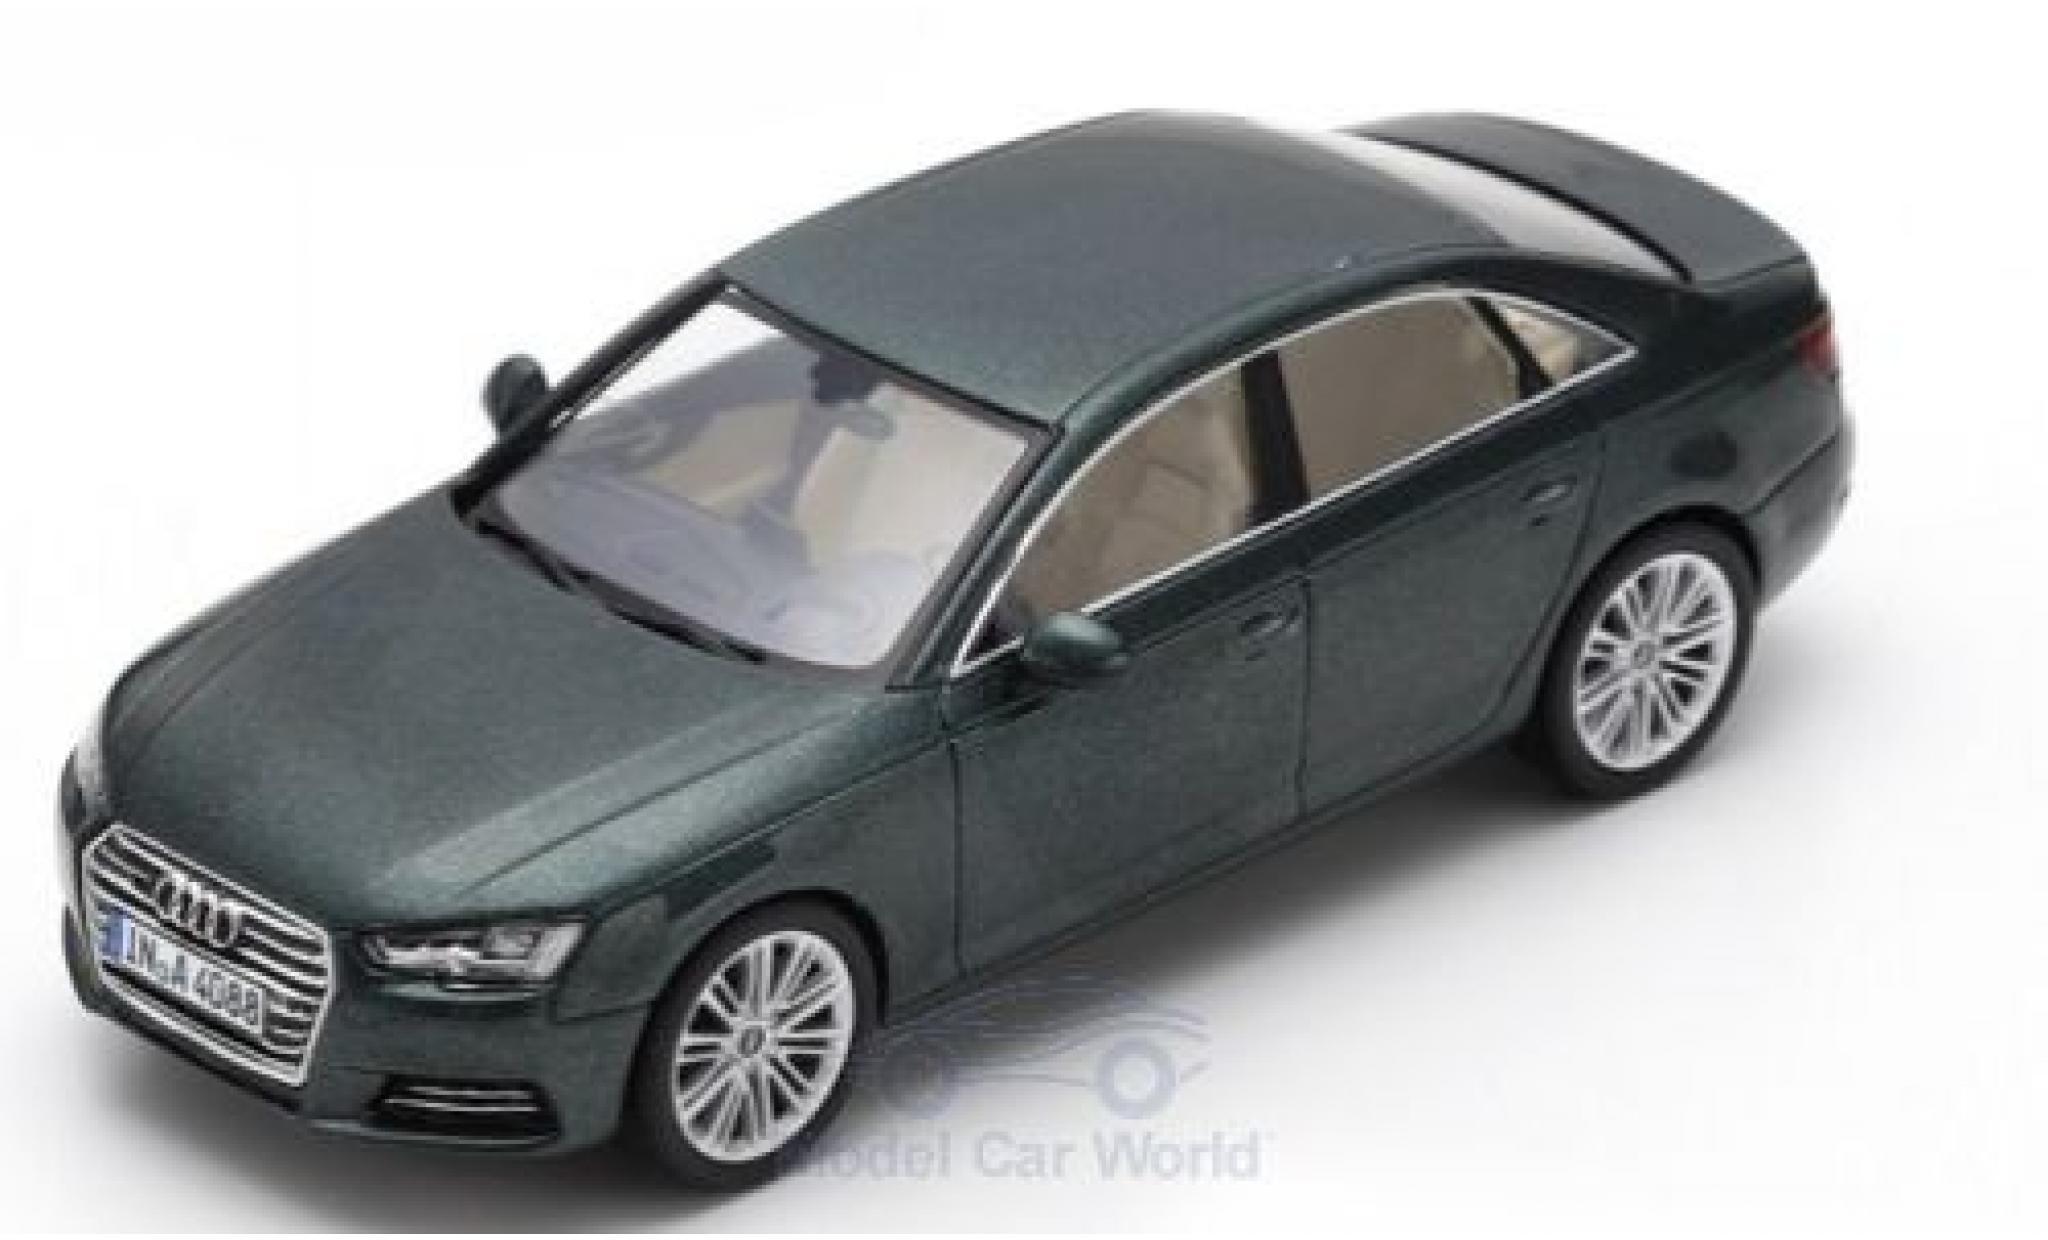 Audi A4 1/43 Spark metallic green 2016